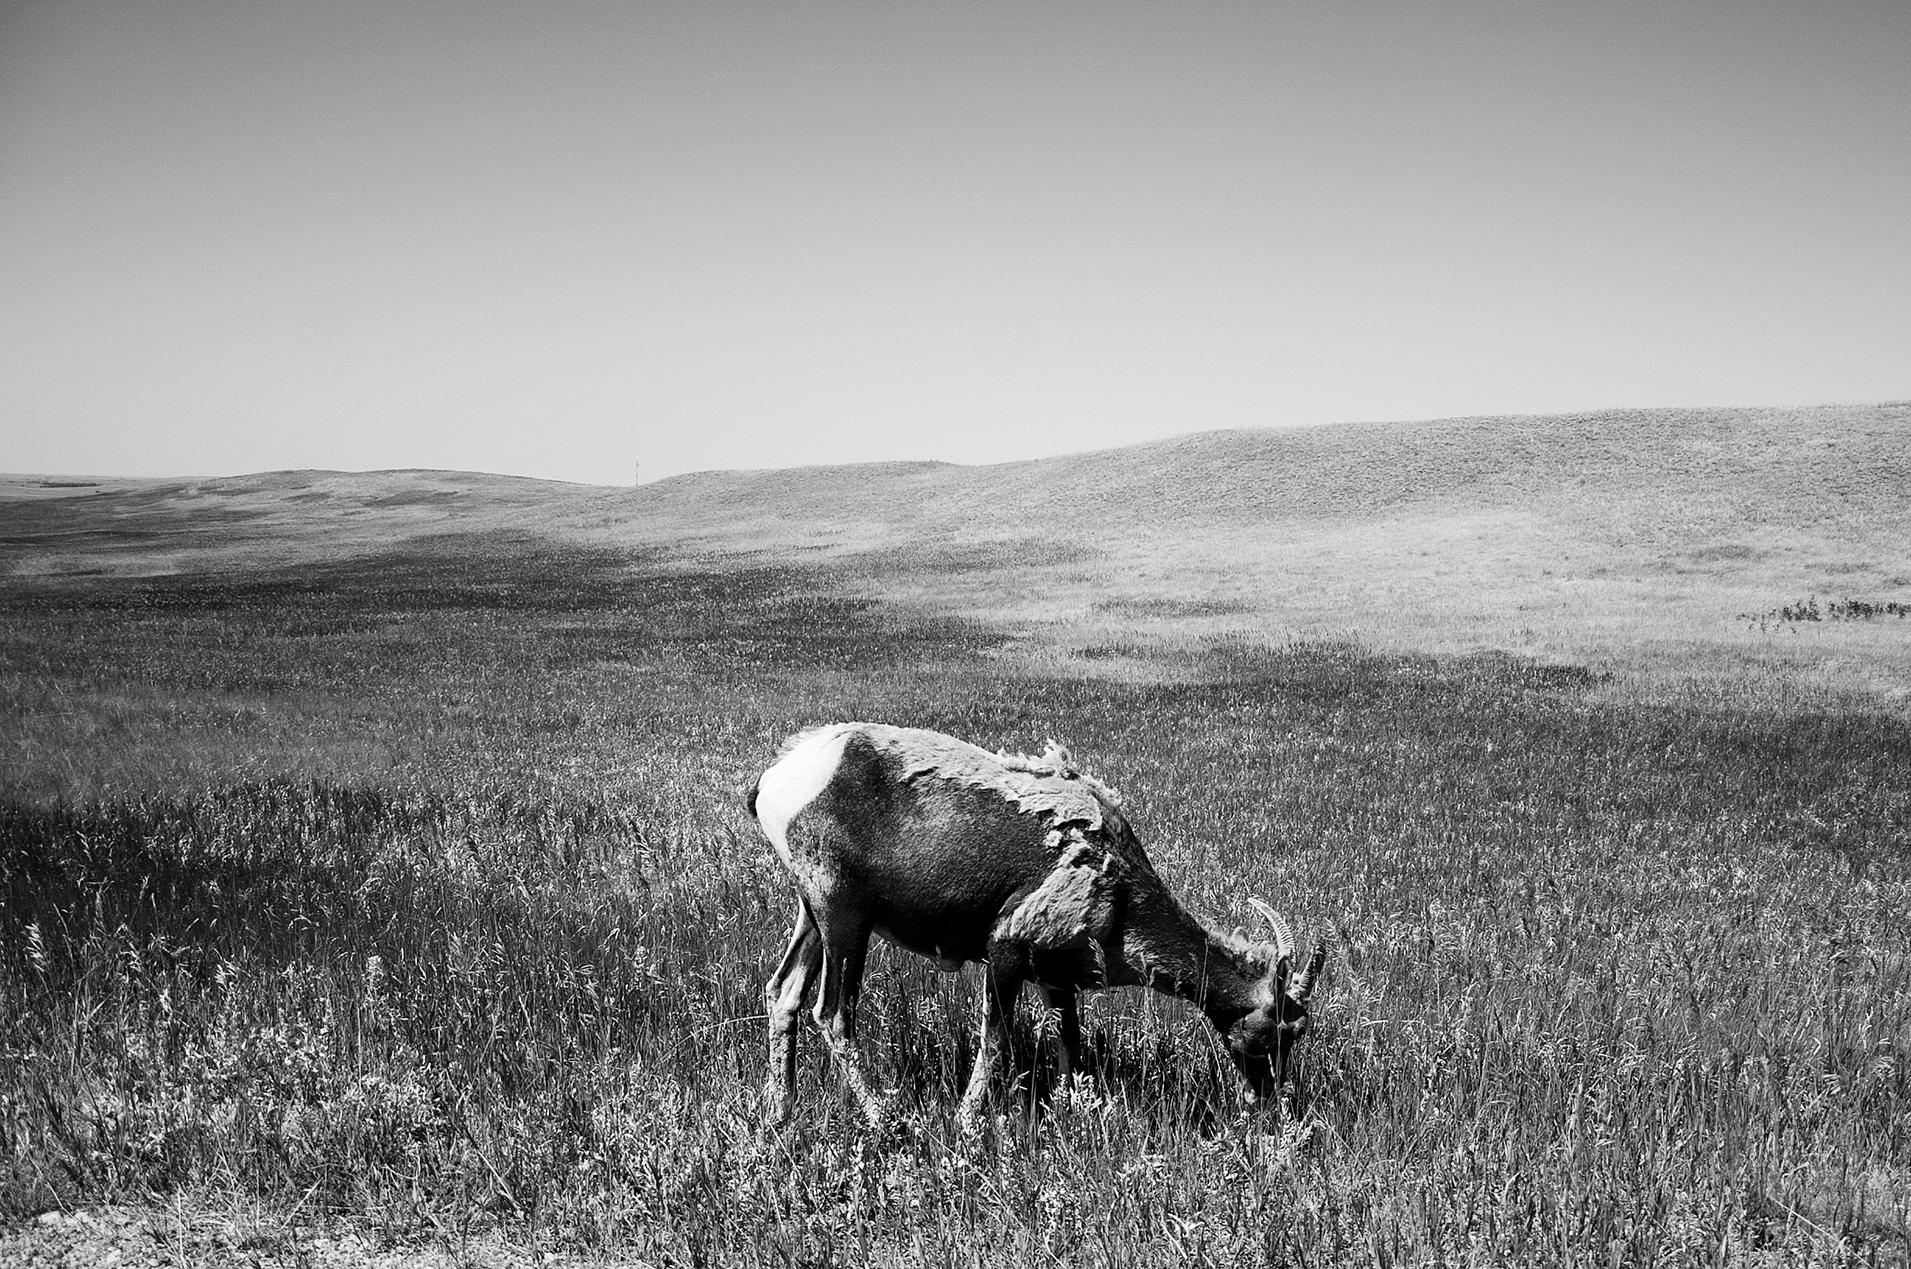 Bighorn sheep in Badlands National Park, SD